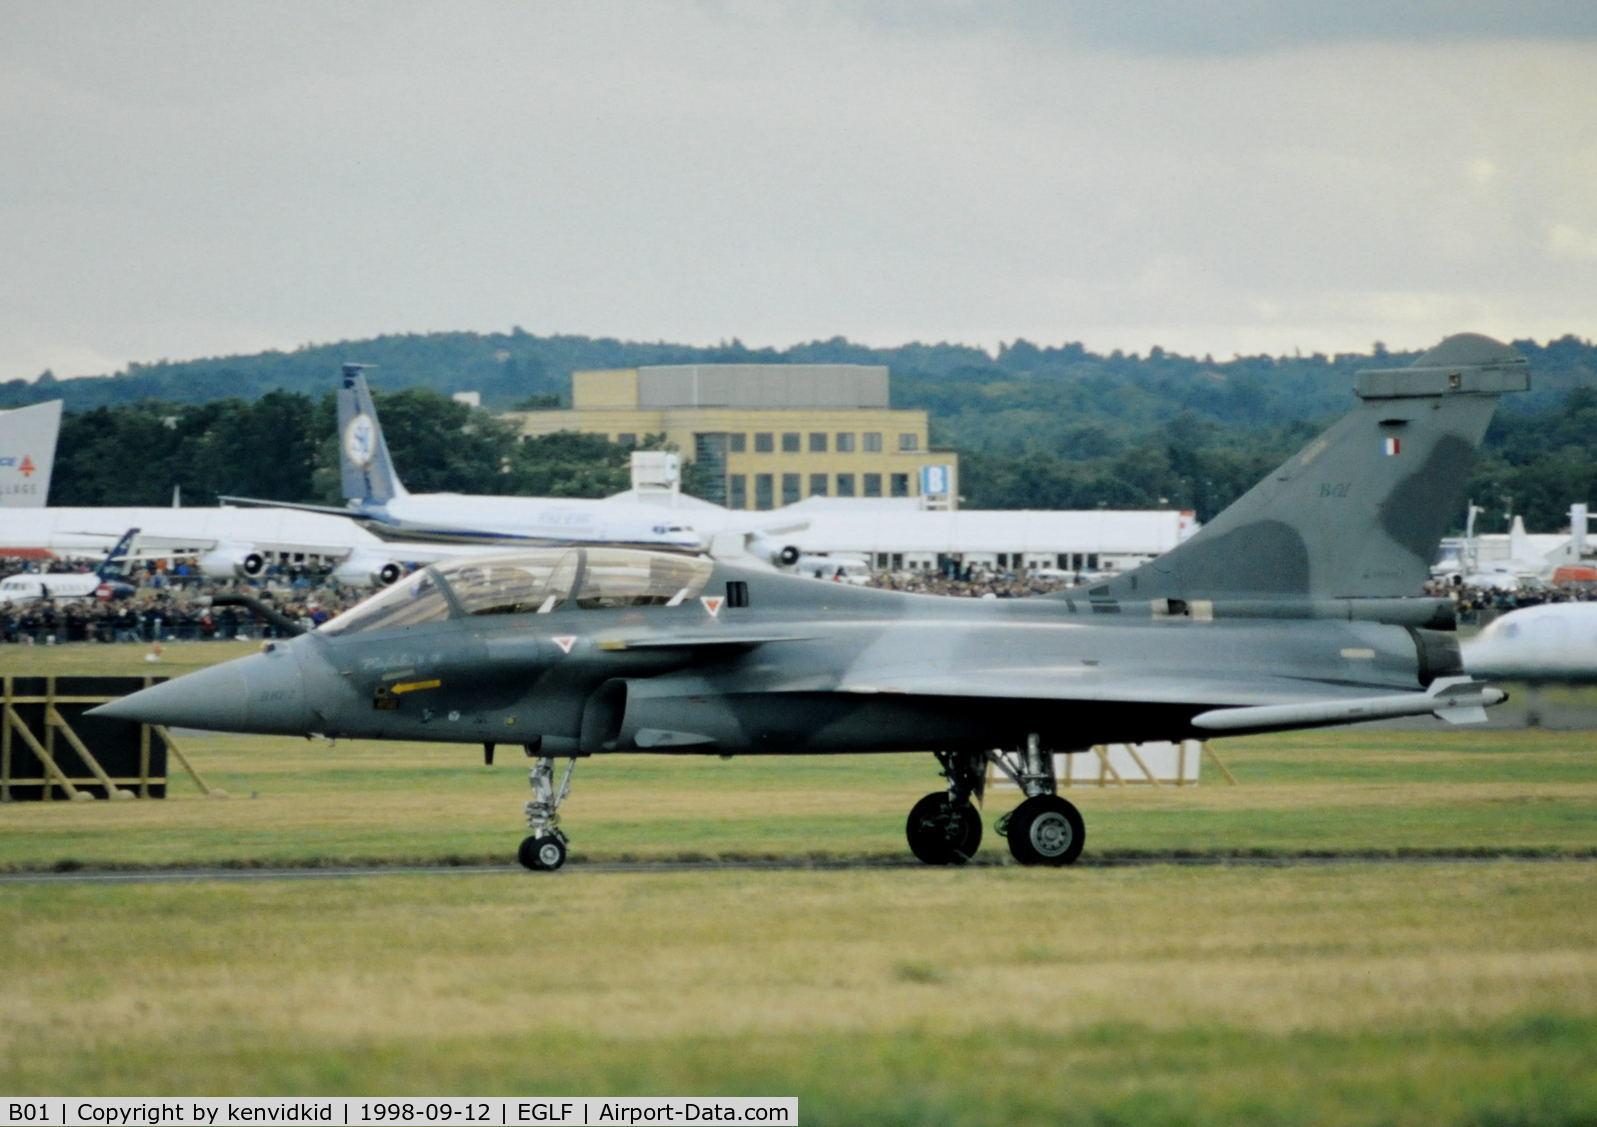 B01, Dassault Rafale B C/N B01, Taxying for take off at the 1998 Farnborough International Air Show.